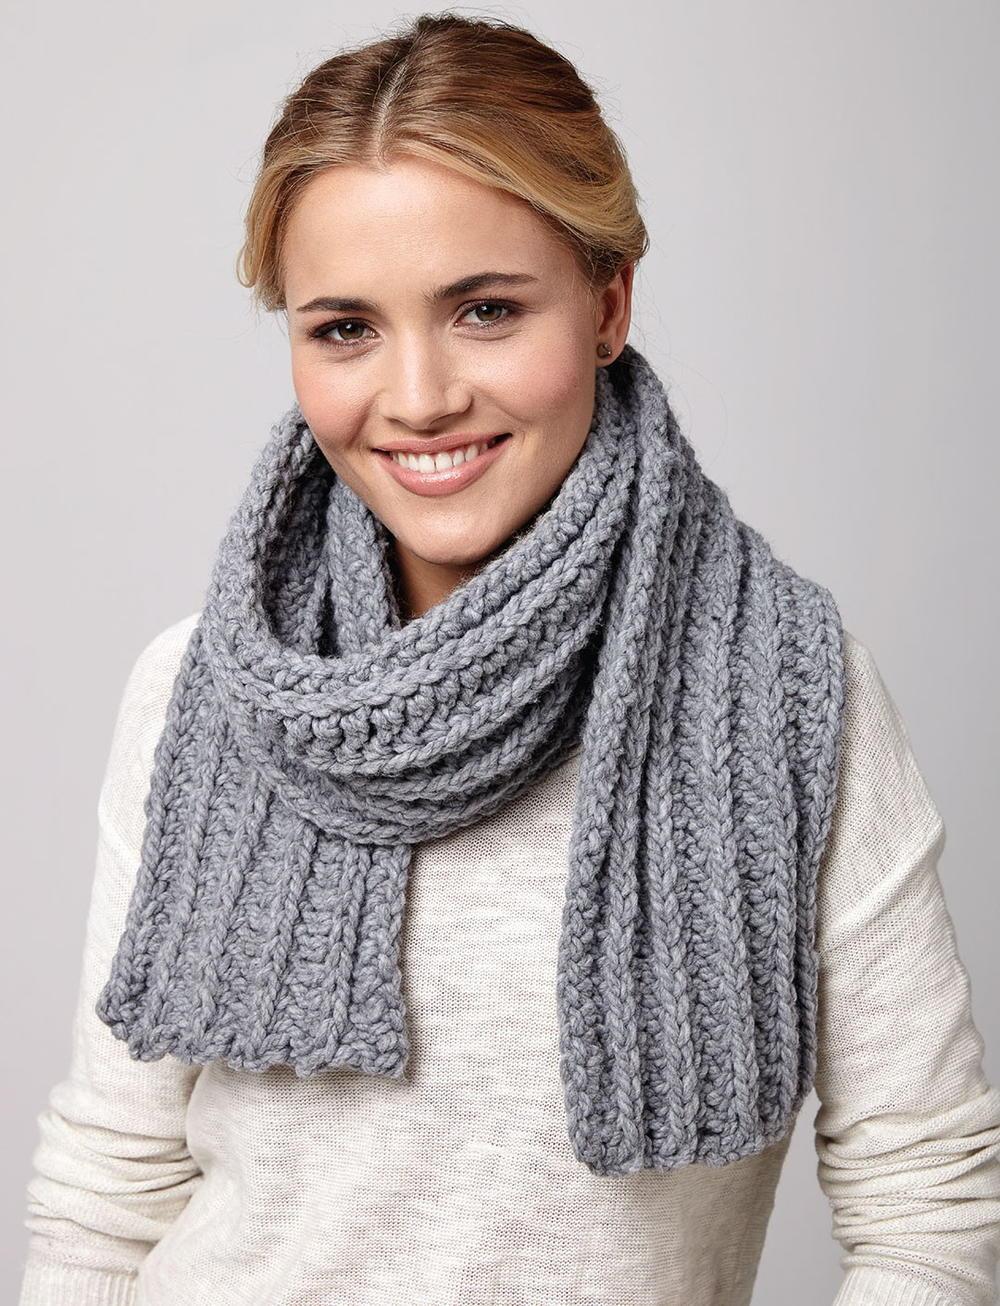 Winter Day Crochet Scarf | AllFreeCrochet.com